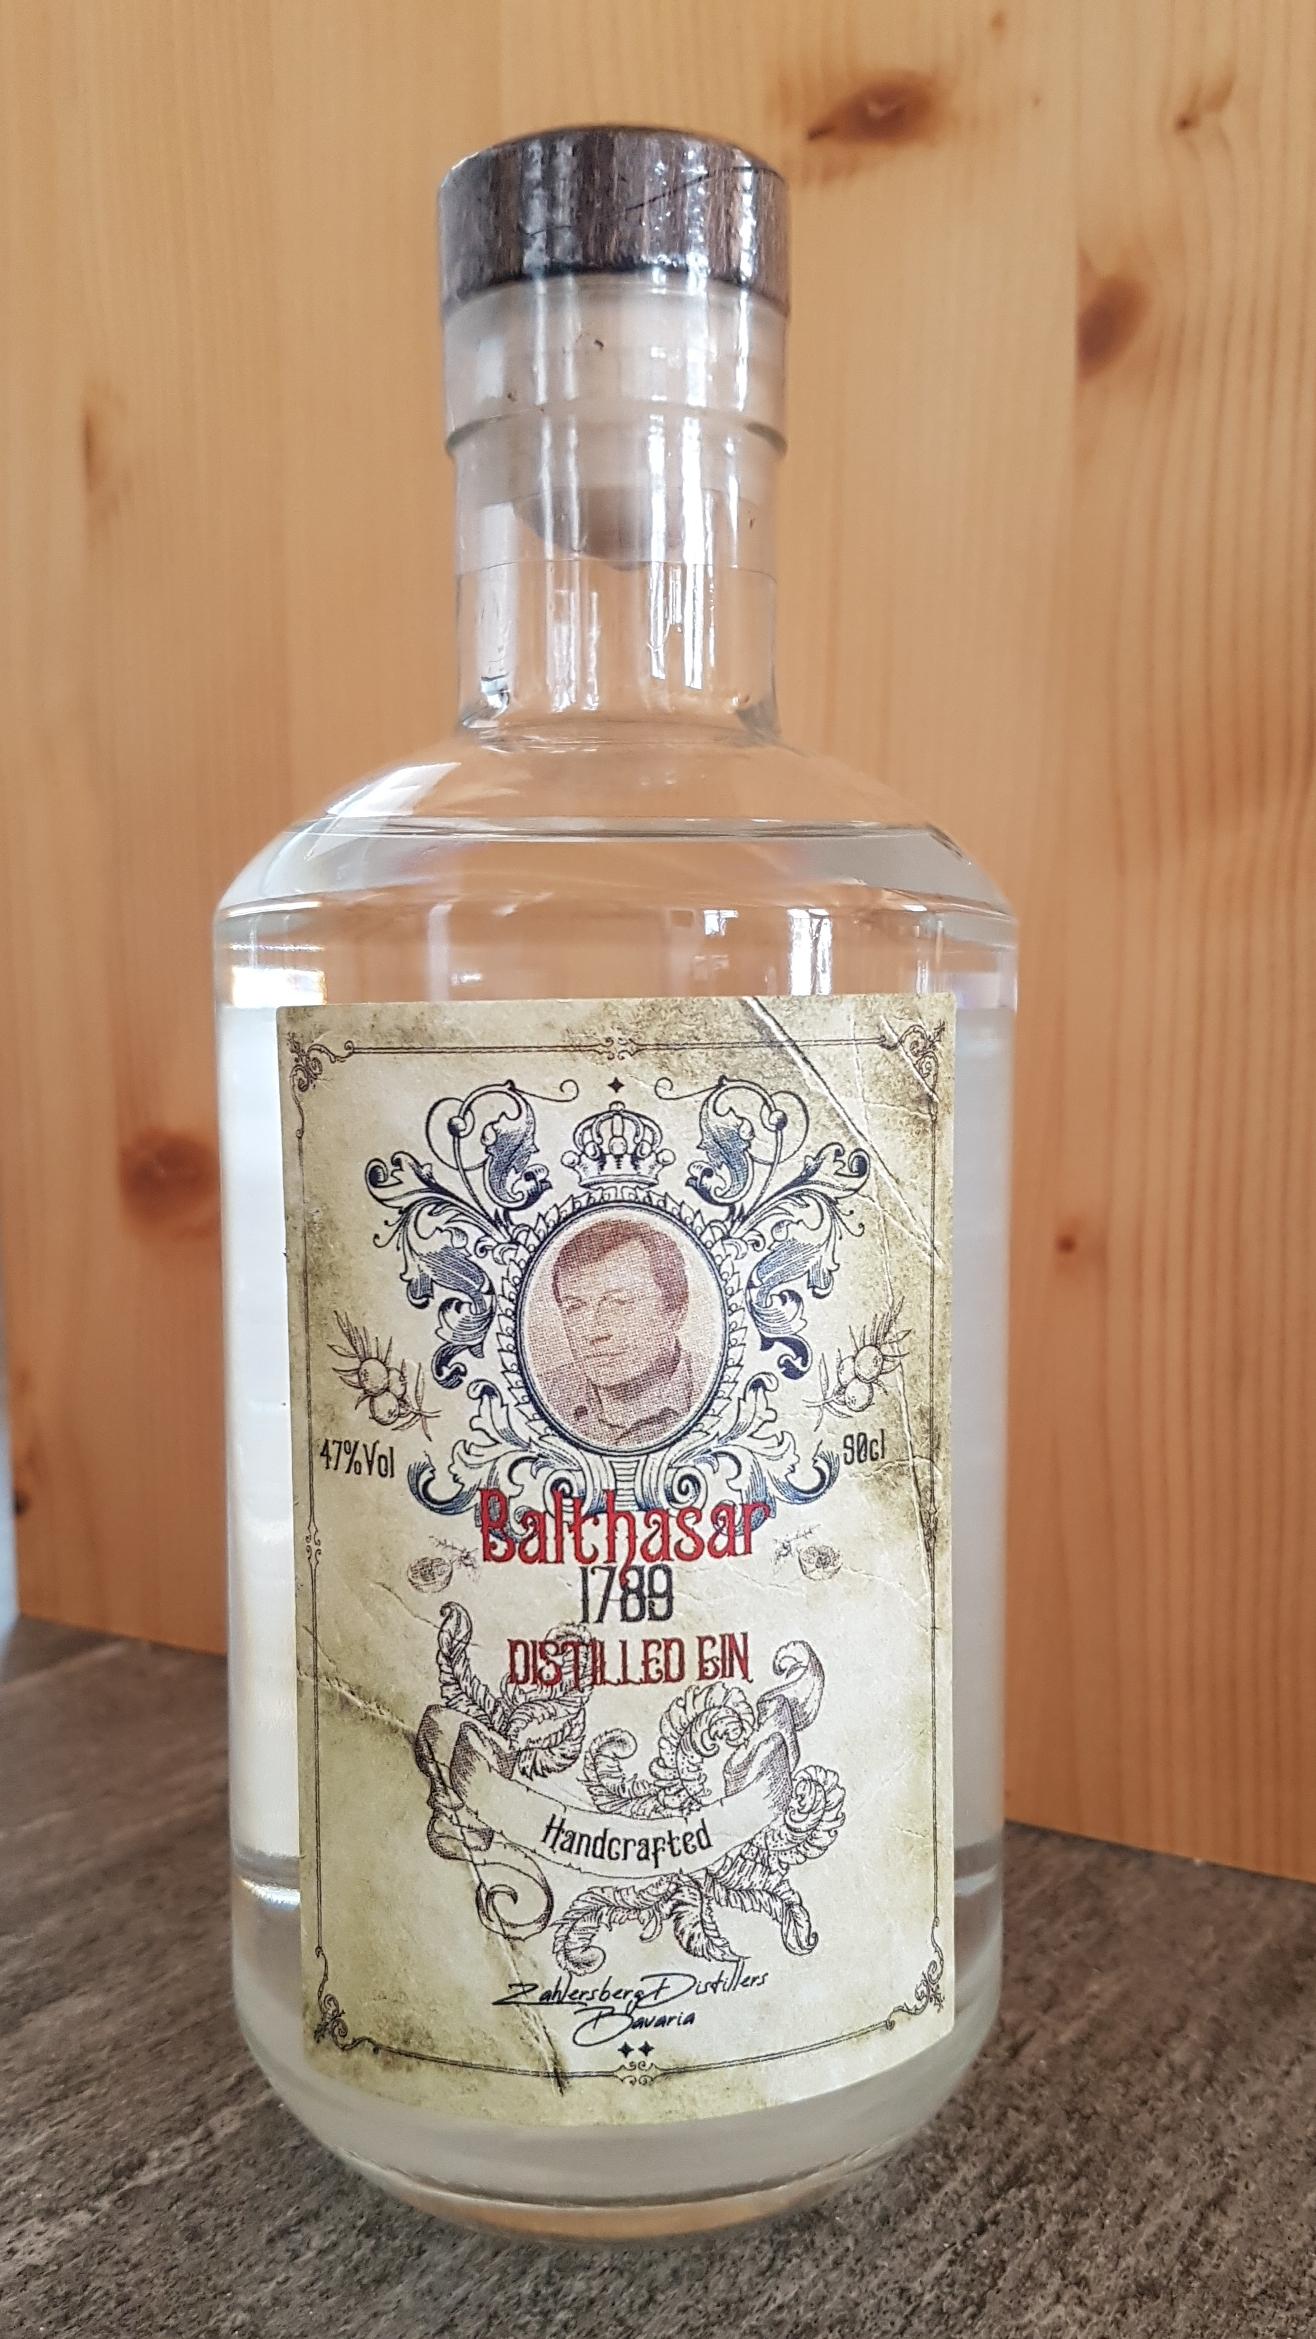 Zahlersberg - Gin BALTHASAR 1789